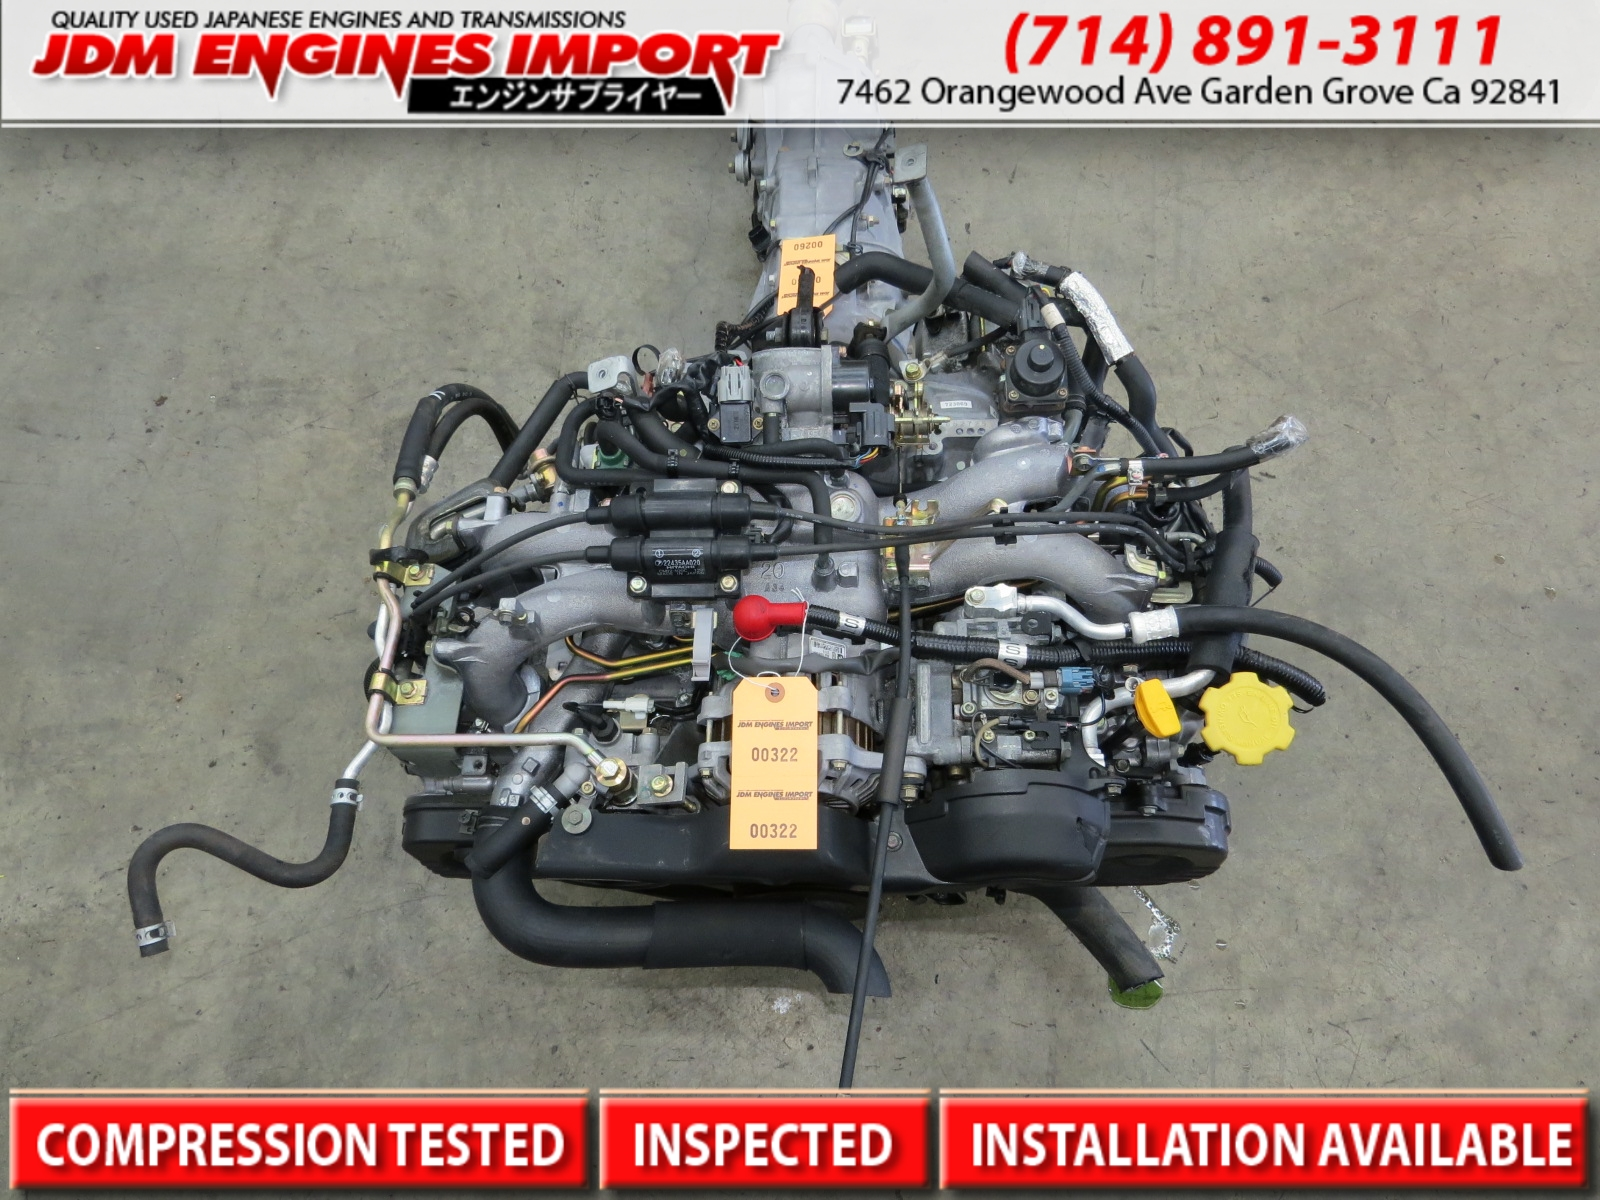 2000-2005 Jdm Subaru Impreza Forester 2 0L Sohc Engine Only JDM